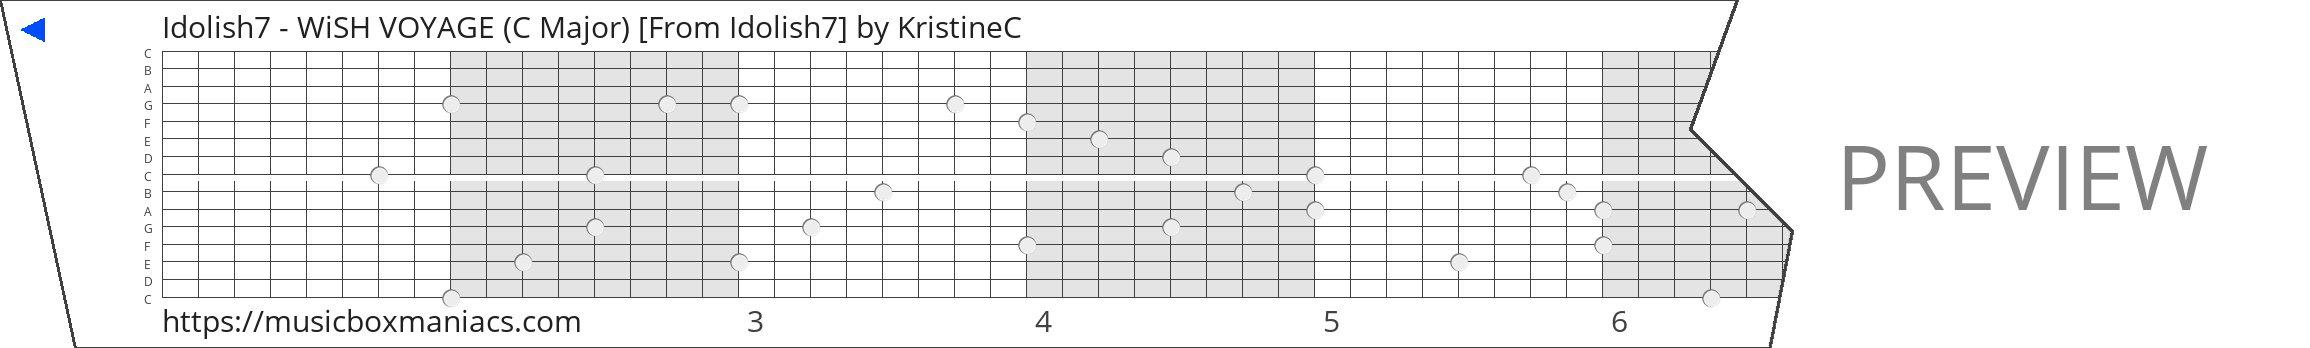 Idolish7 - WiSH VOYAGE (C Major) [From Idolish7] 15 note music box paper strip